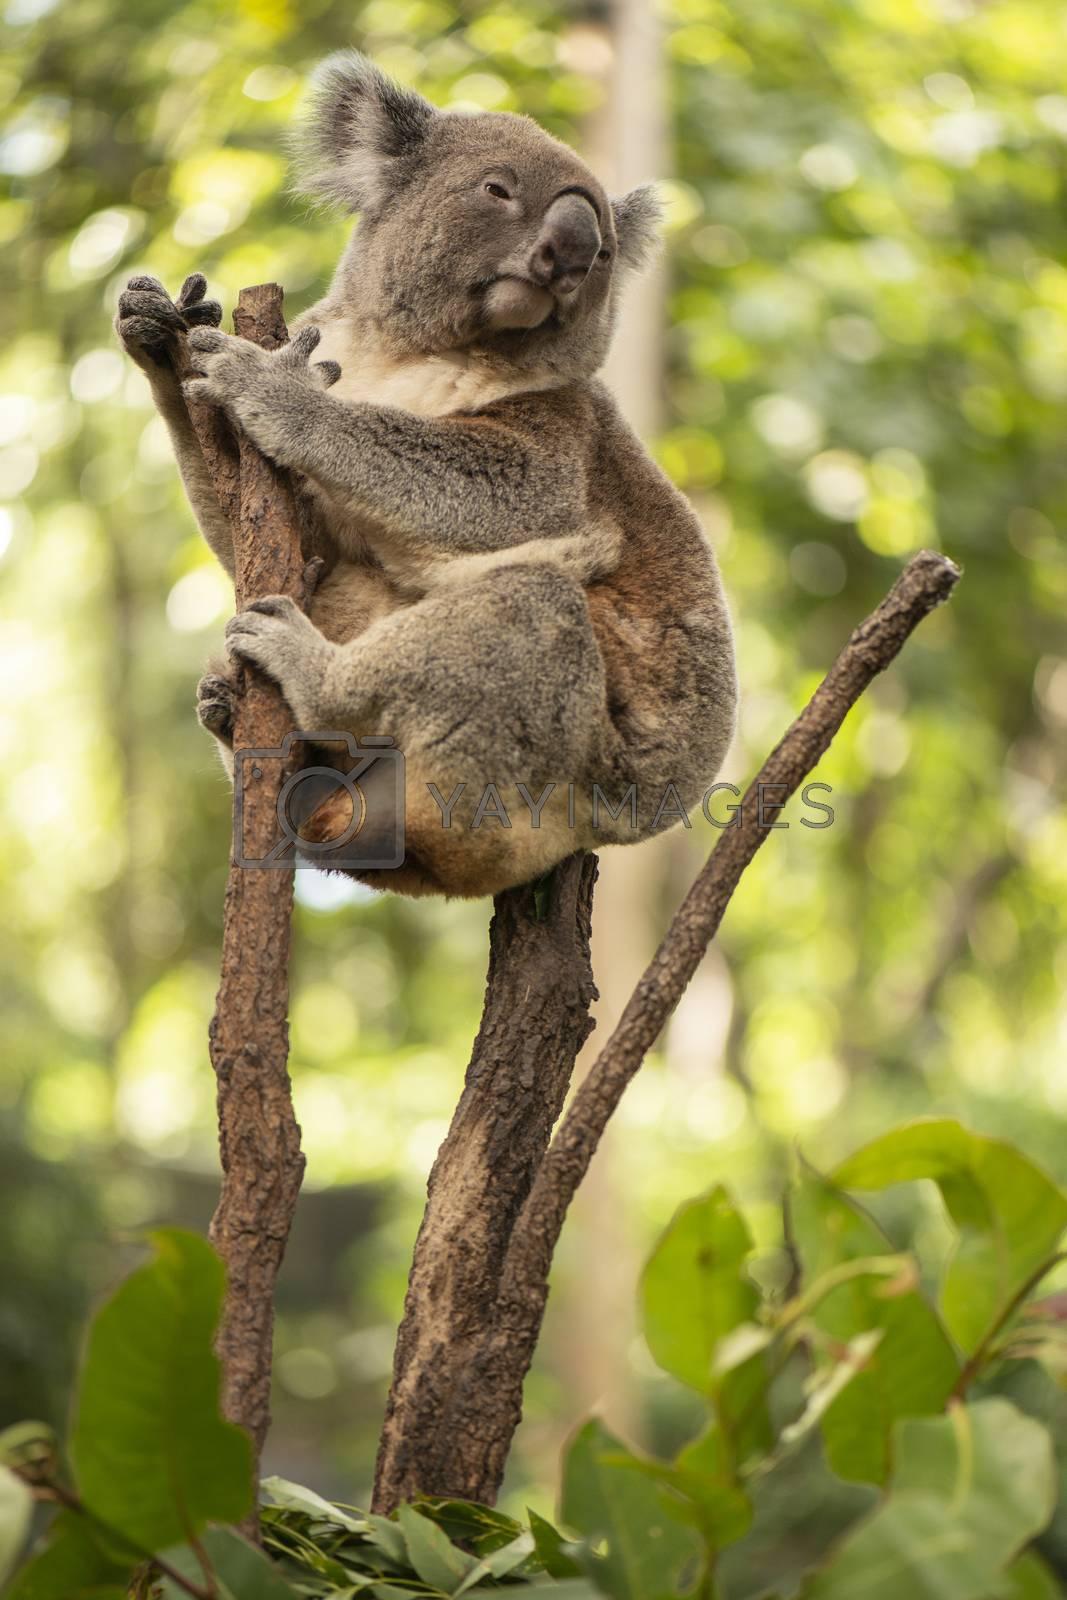 Cute Australian Koala in a tree resting during the day.